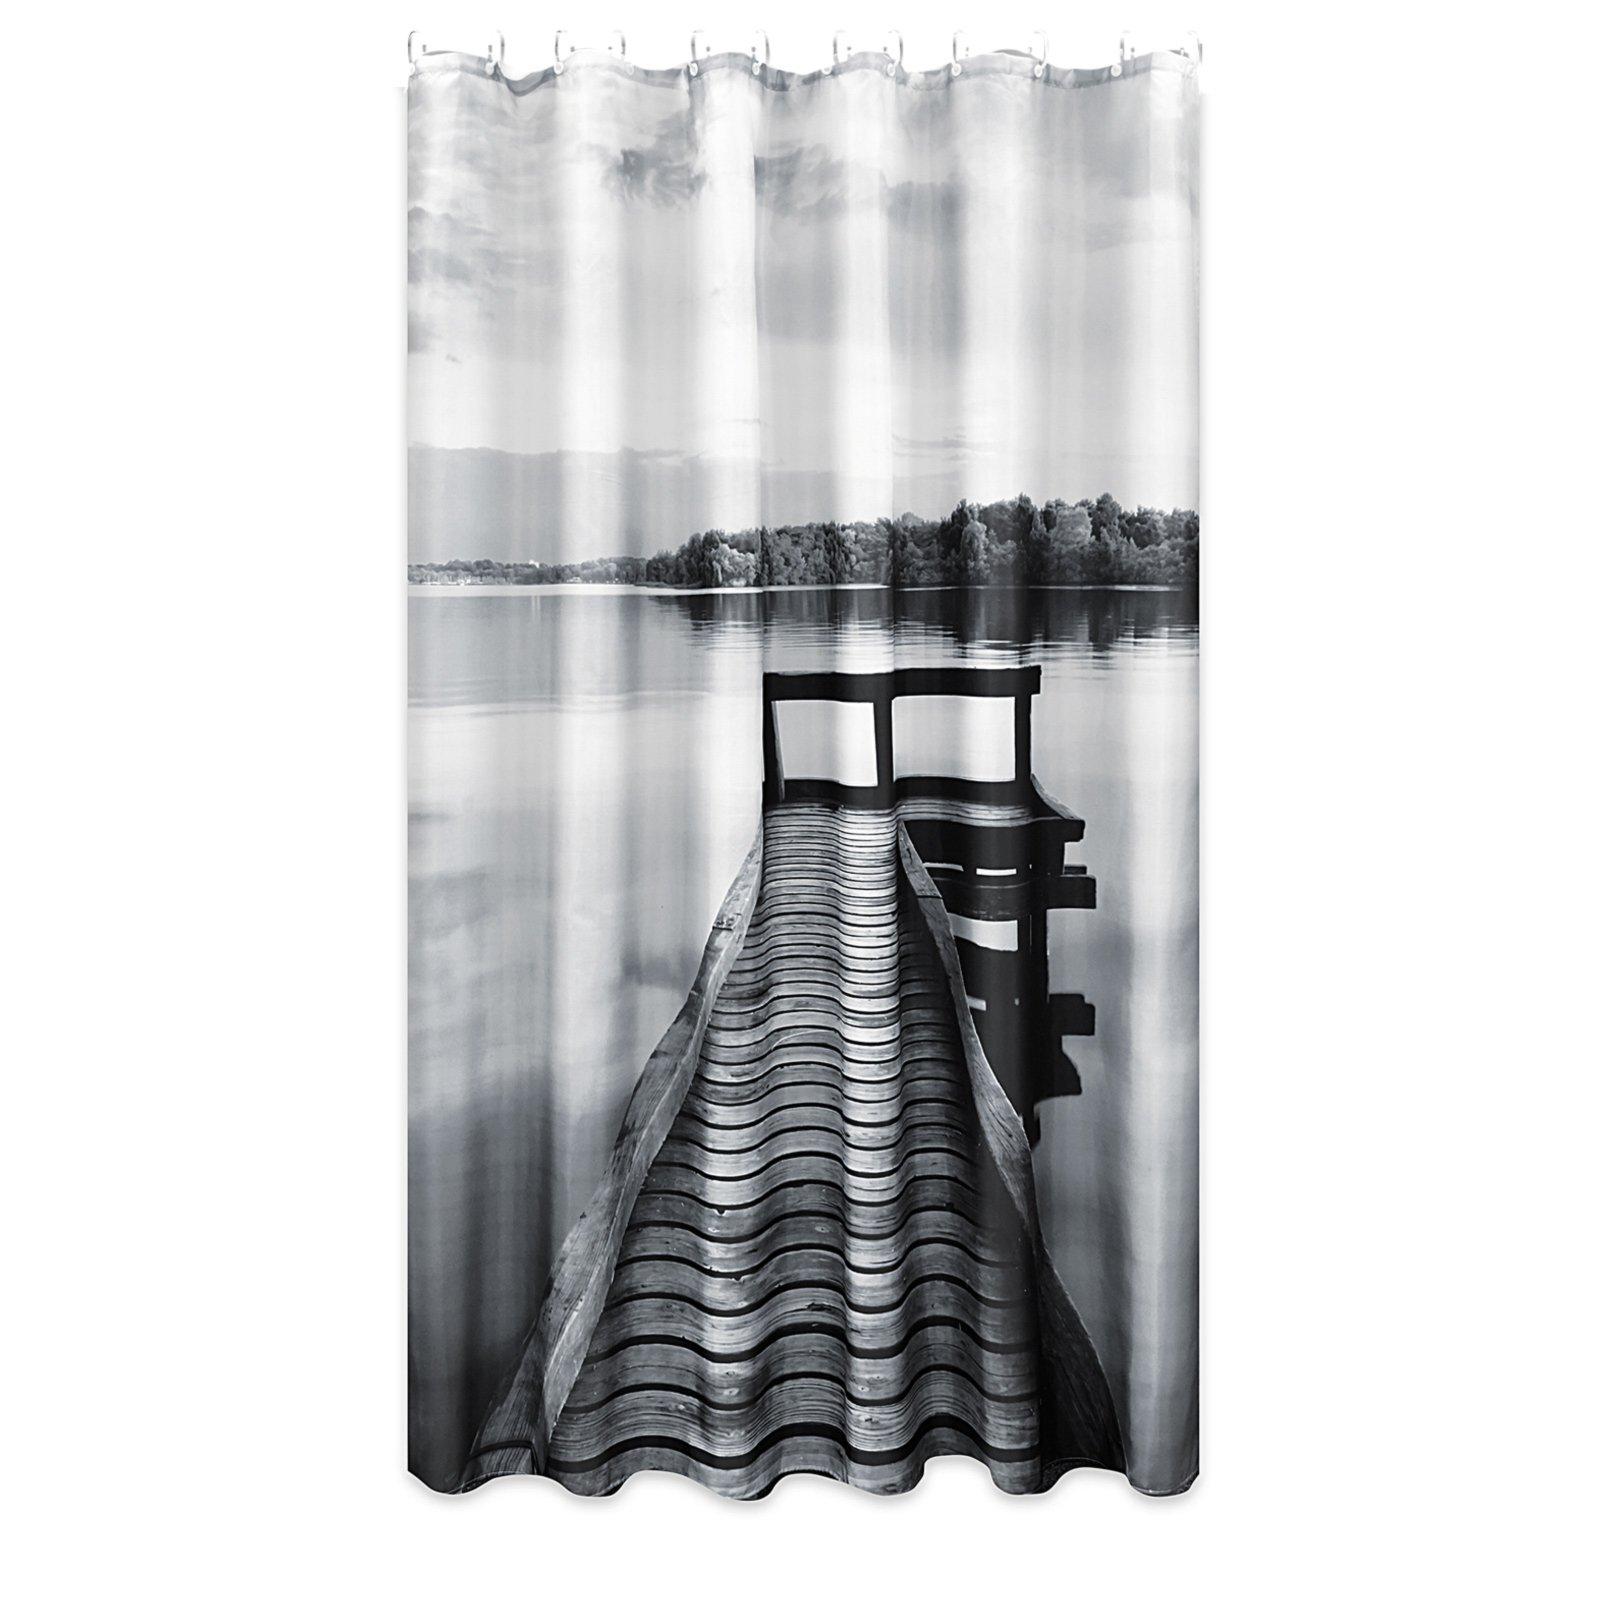 duschvorhang silence schwarz wei 60x60 cm online. Black Bedroom Furniture Sets. Home Design Ideas